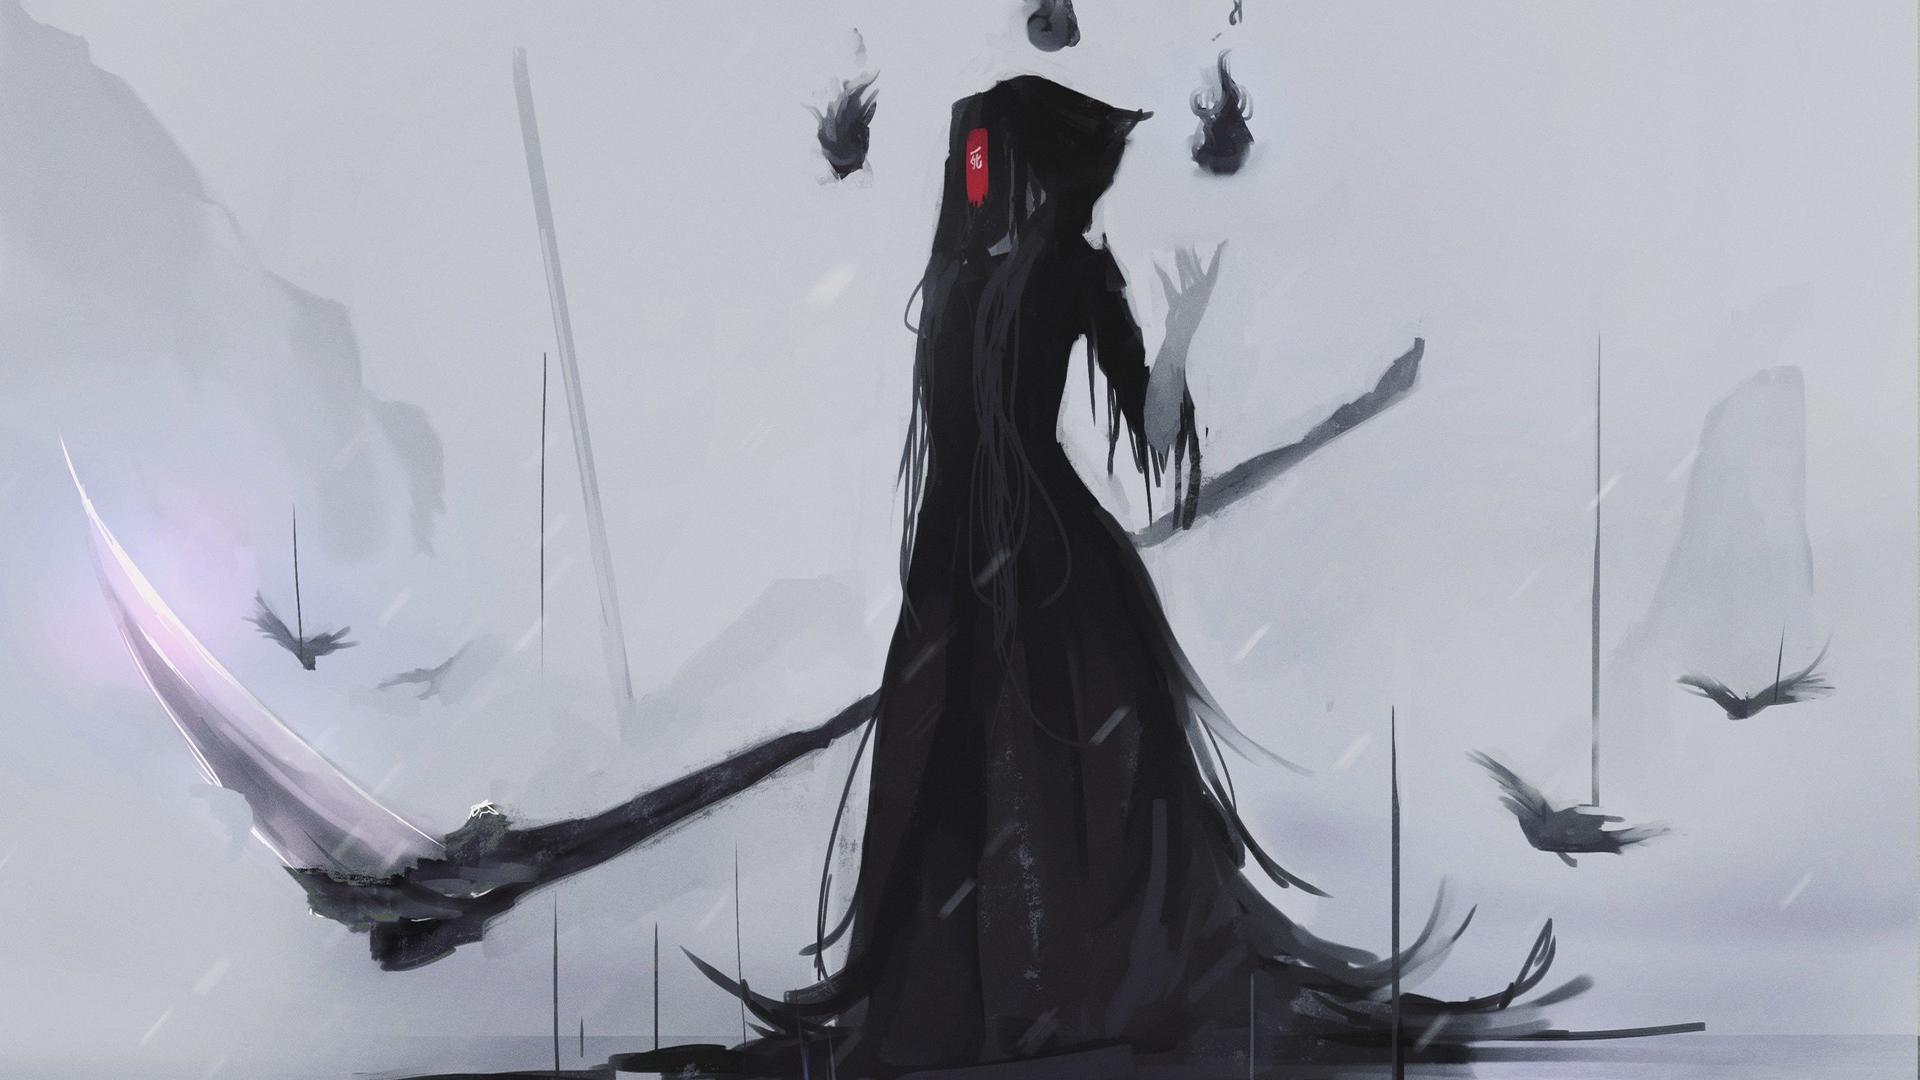 Wallpaper Aoi Ogata Grim Reaper Scythe Mask Black Dress Anime Girls 1920x1080 Xhj1235 1932331 Hd Wallpapers Wallhere